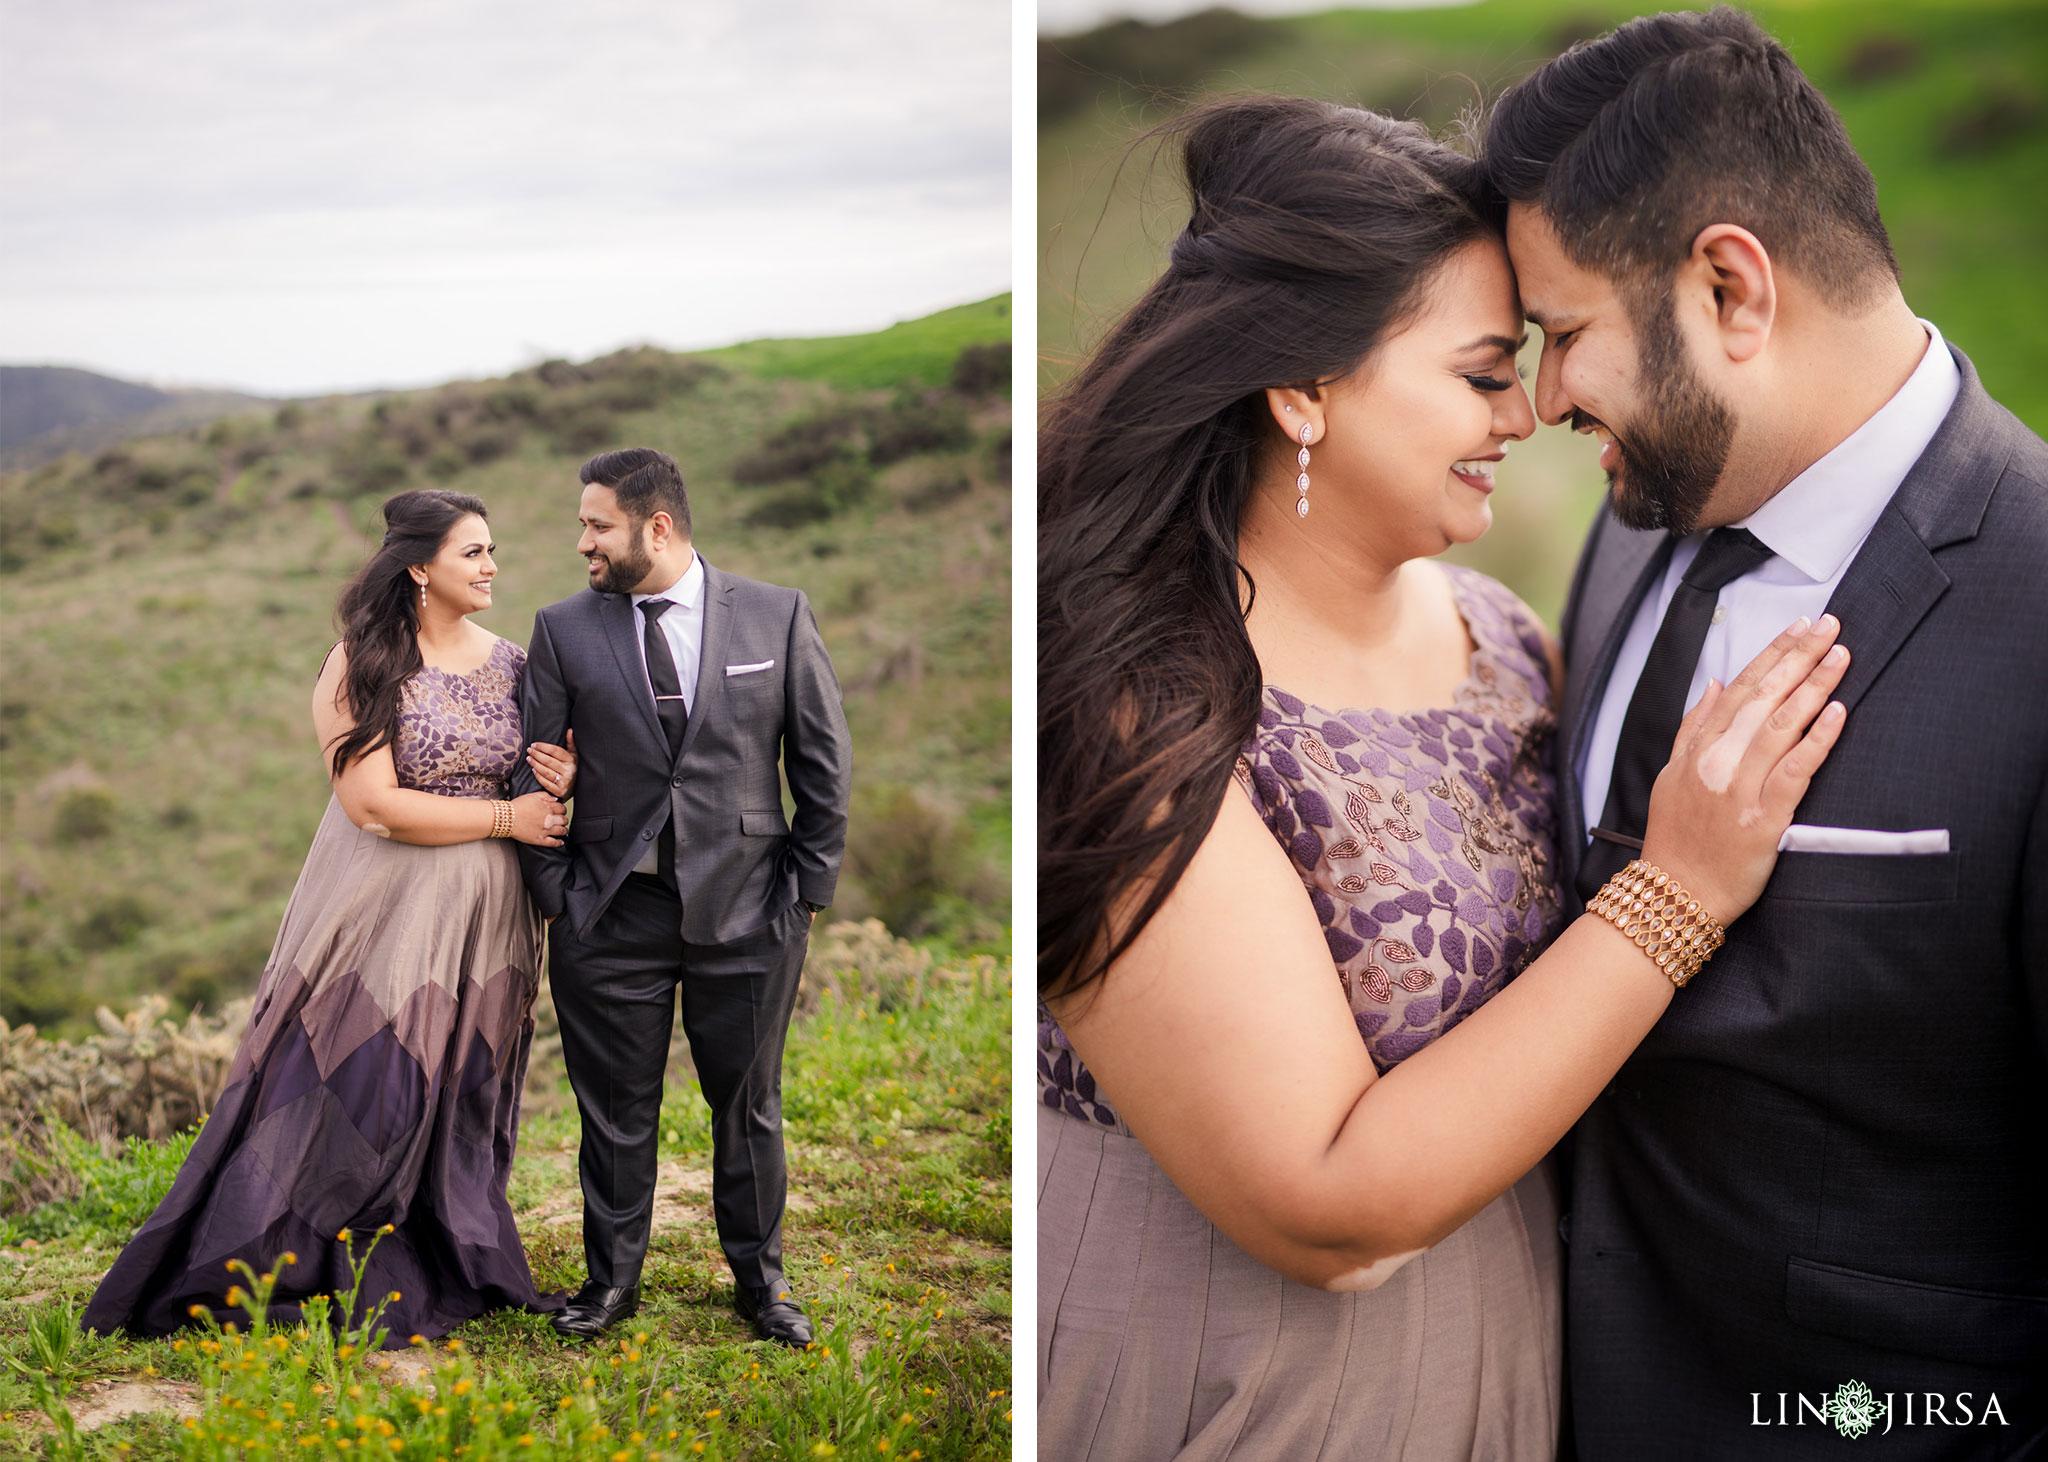 01 Heisler Park Laguna Beach Engagement Photography